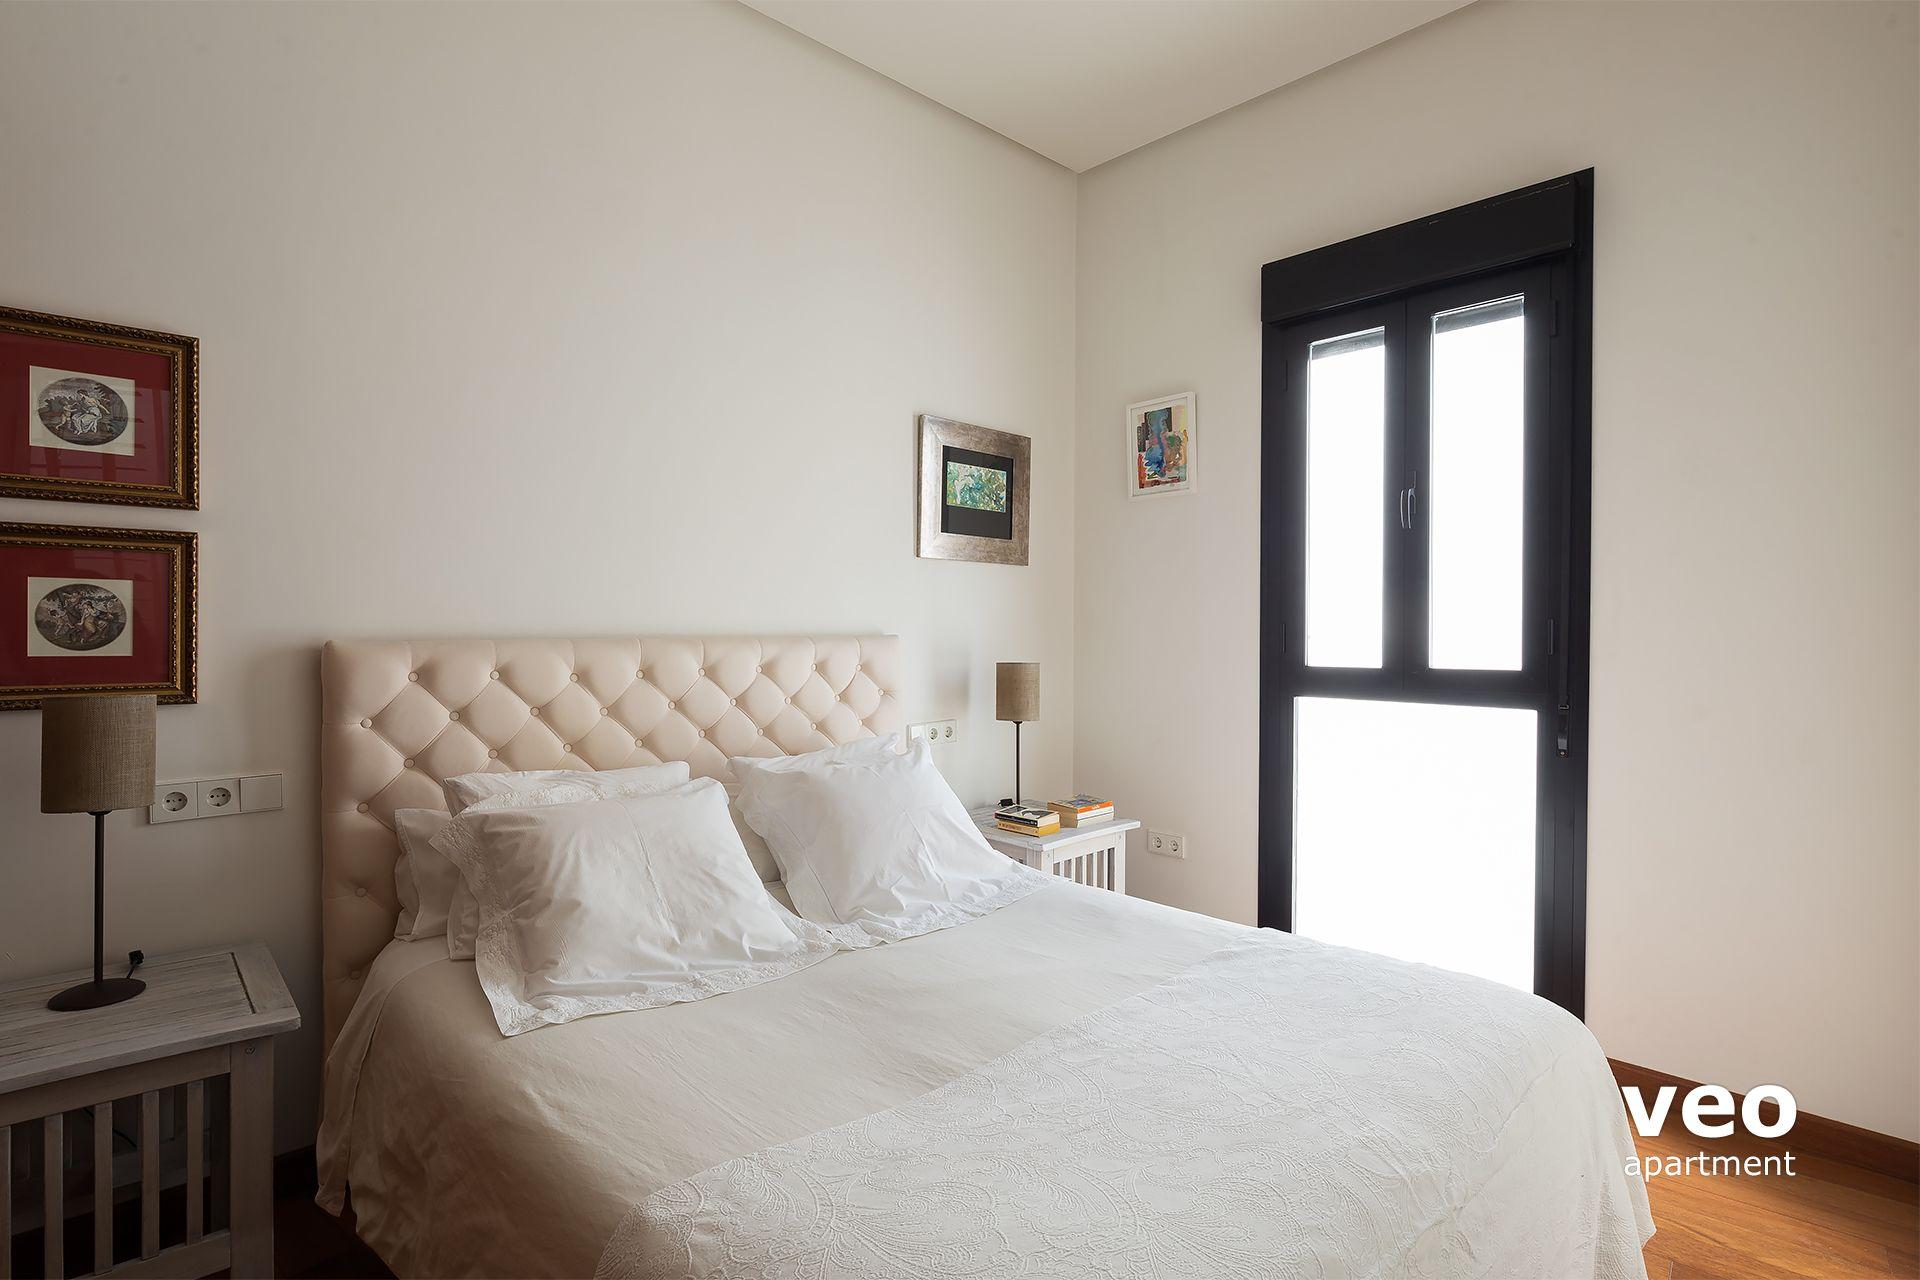 Appartement Rue Corral del Rey Séville Espagne